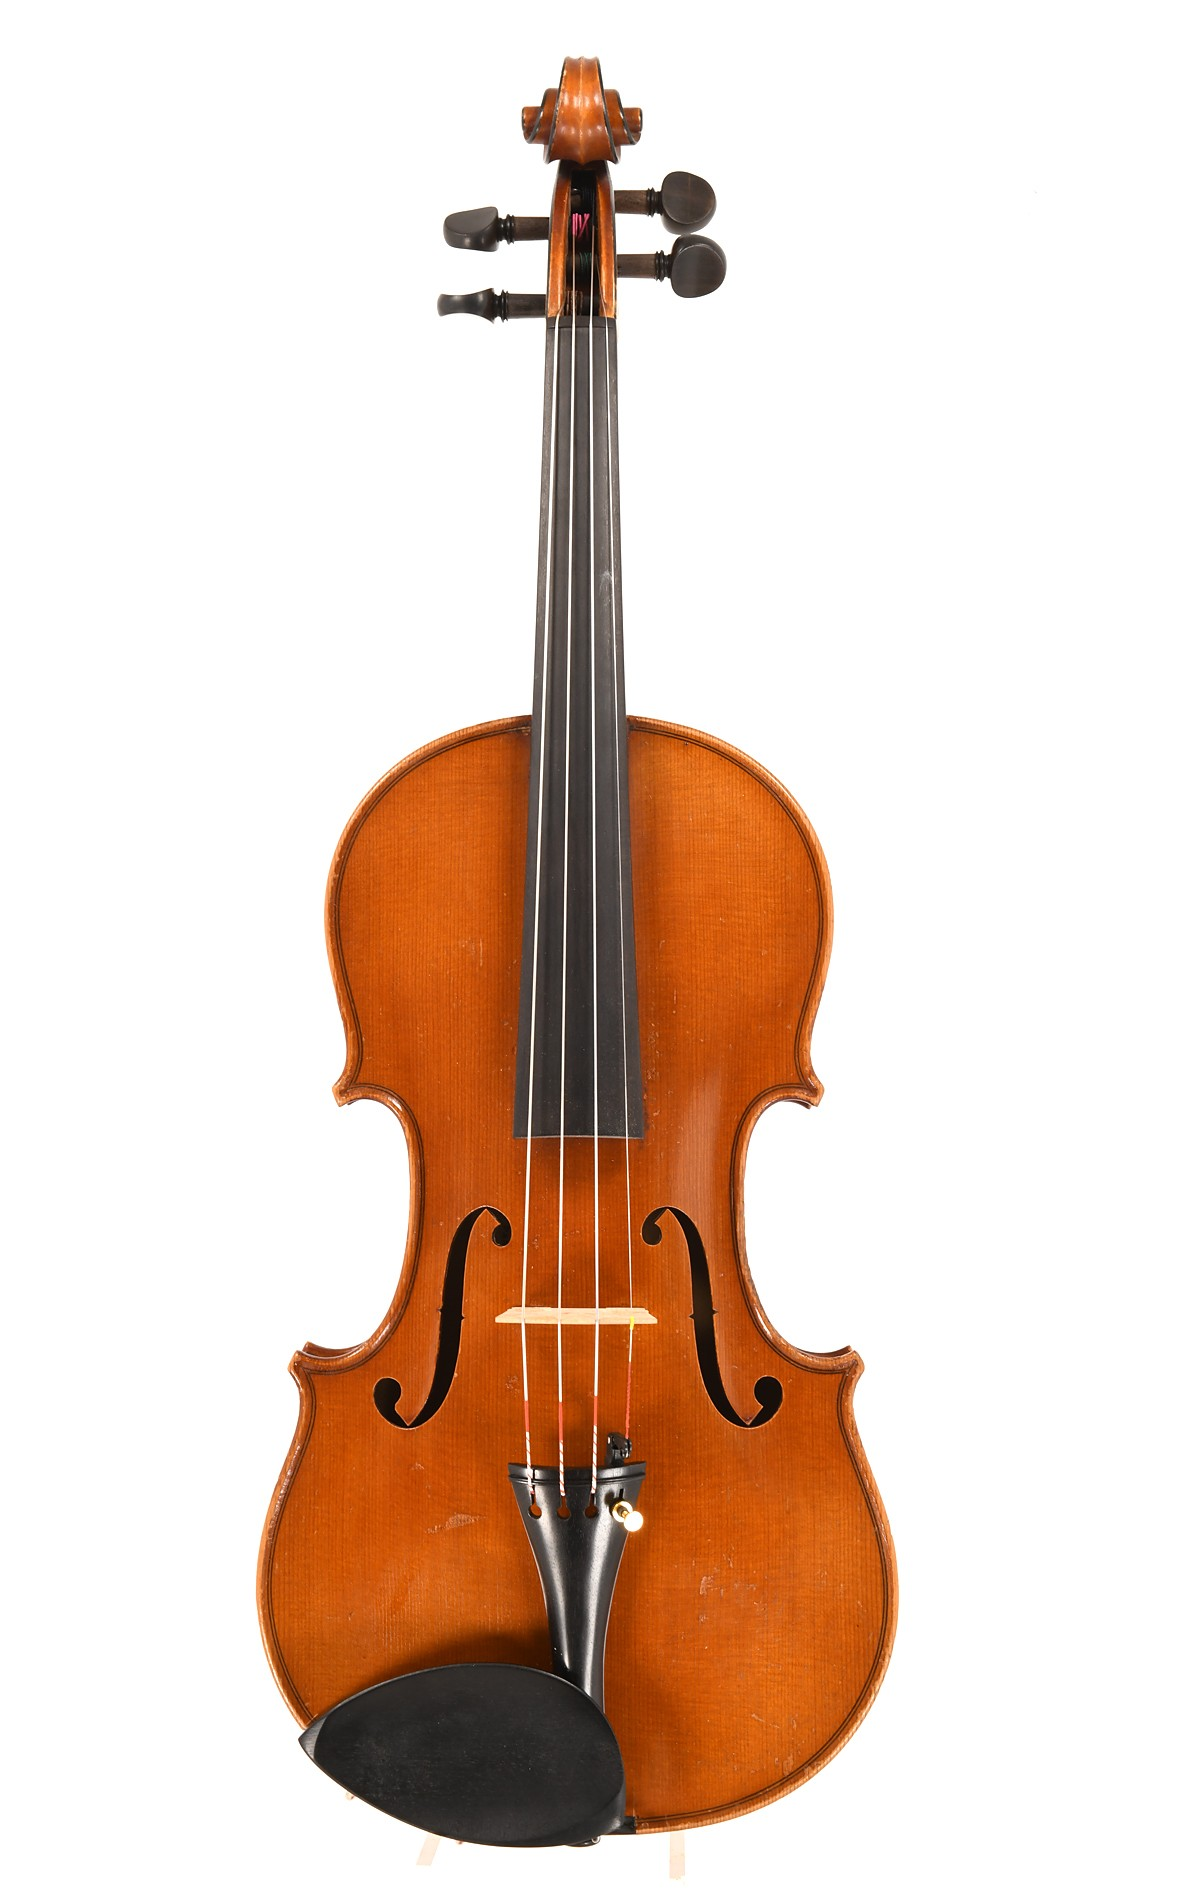 Fine French violin by Eugene Langonet, Nantes